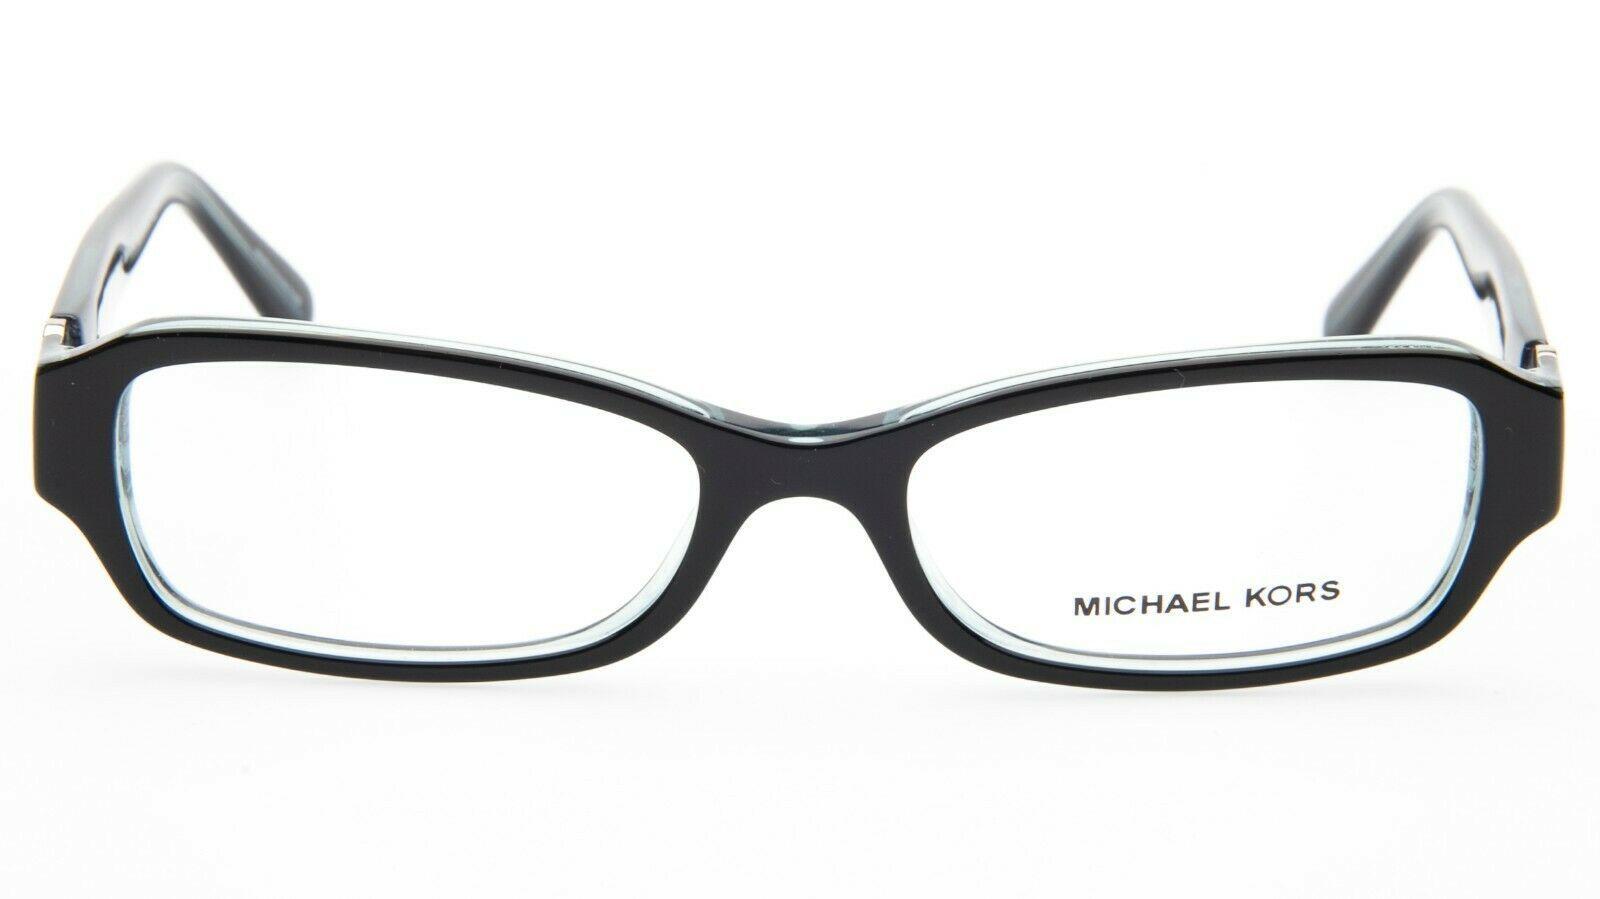 NEW MICHAEL KORS MK8002 Anguilla 3001 BLACK BLUE EYEGLASSES FRAME 50-16-135mm